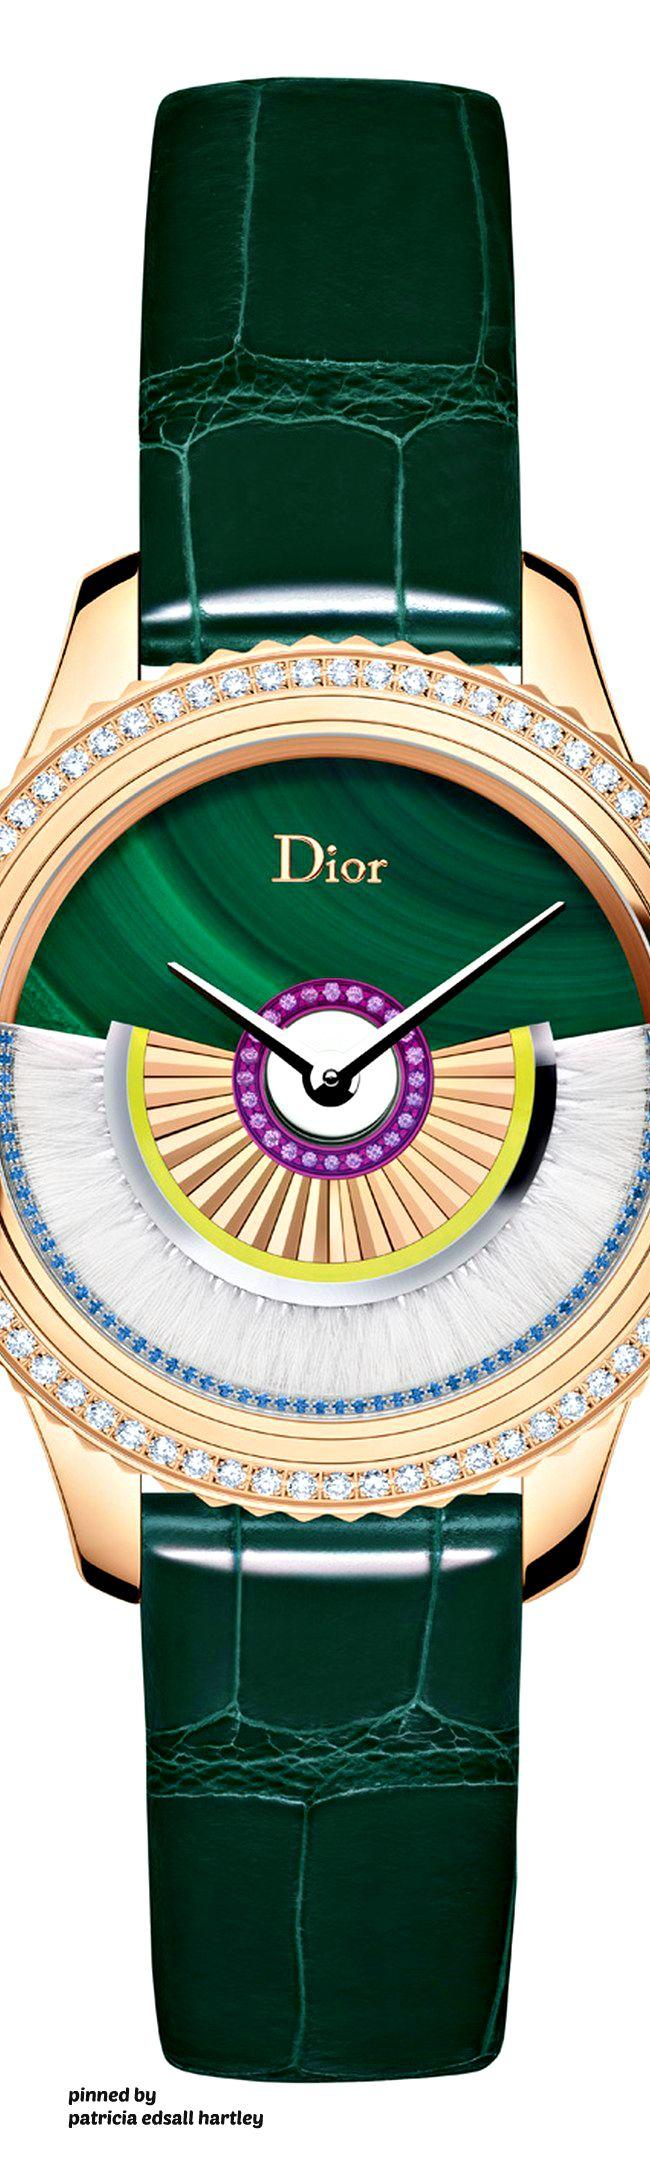 One-of-a-kind Dior VIII Grand Bal Coquette Montaigne watch